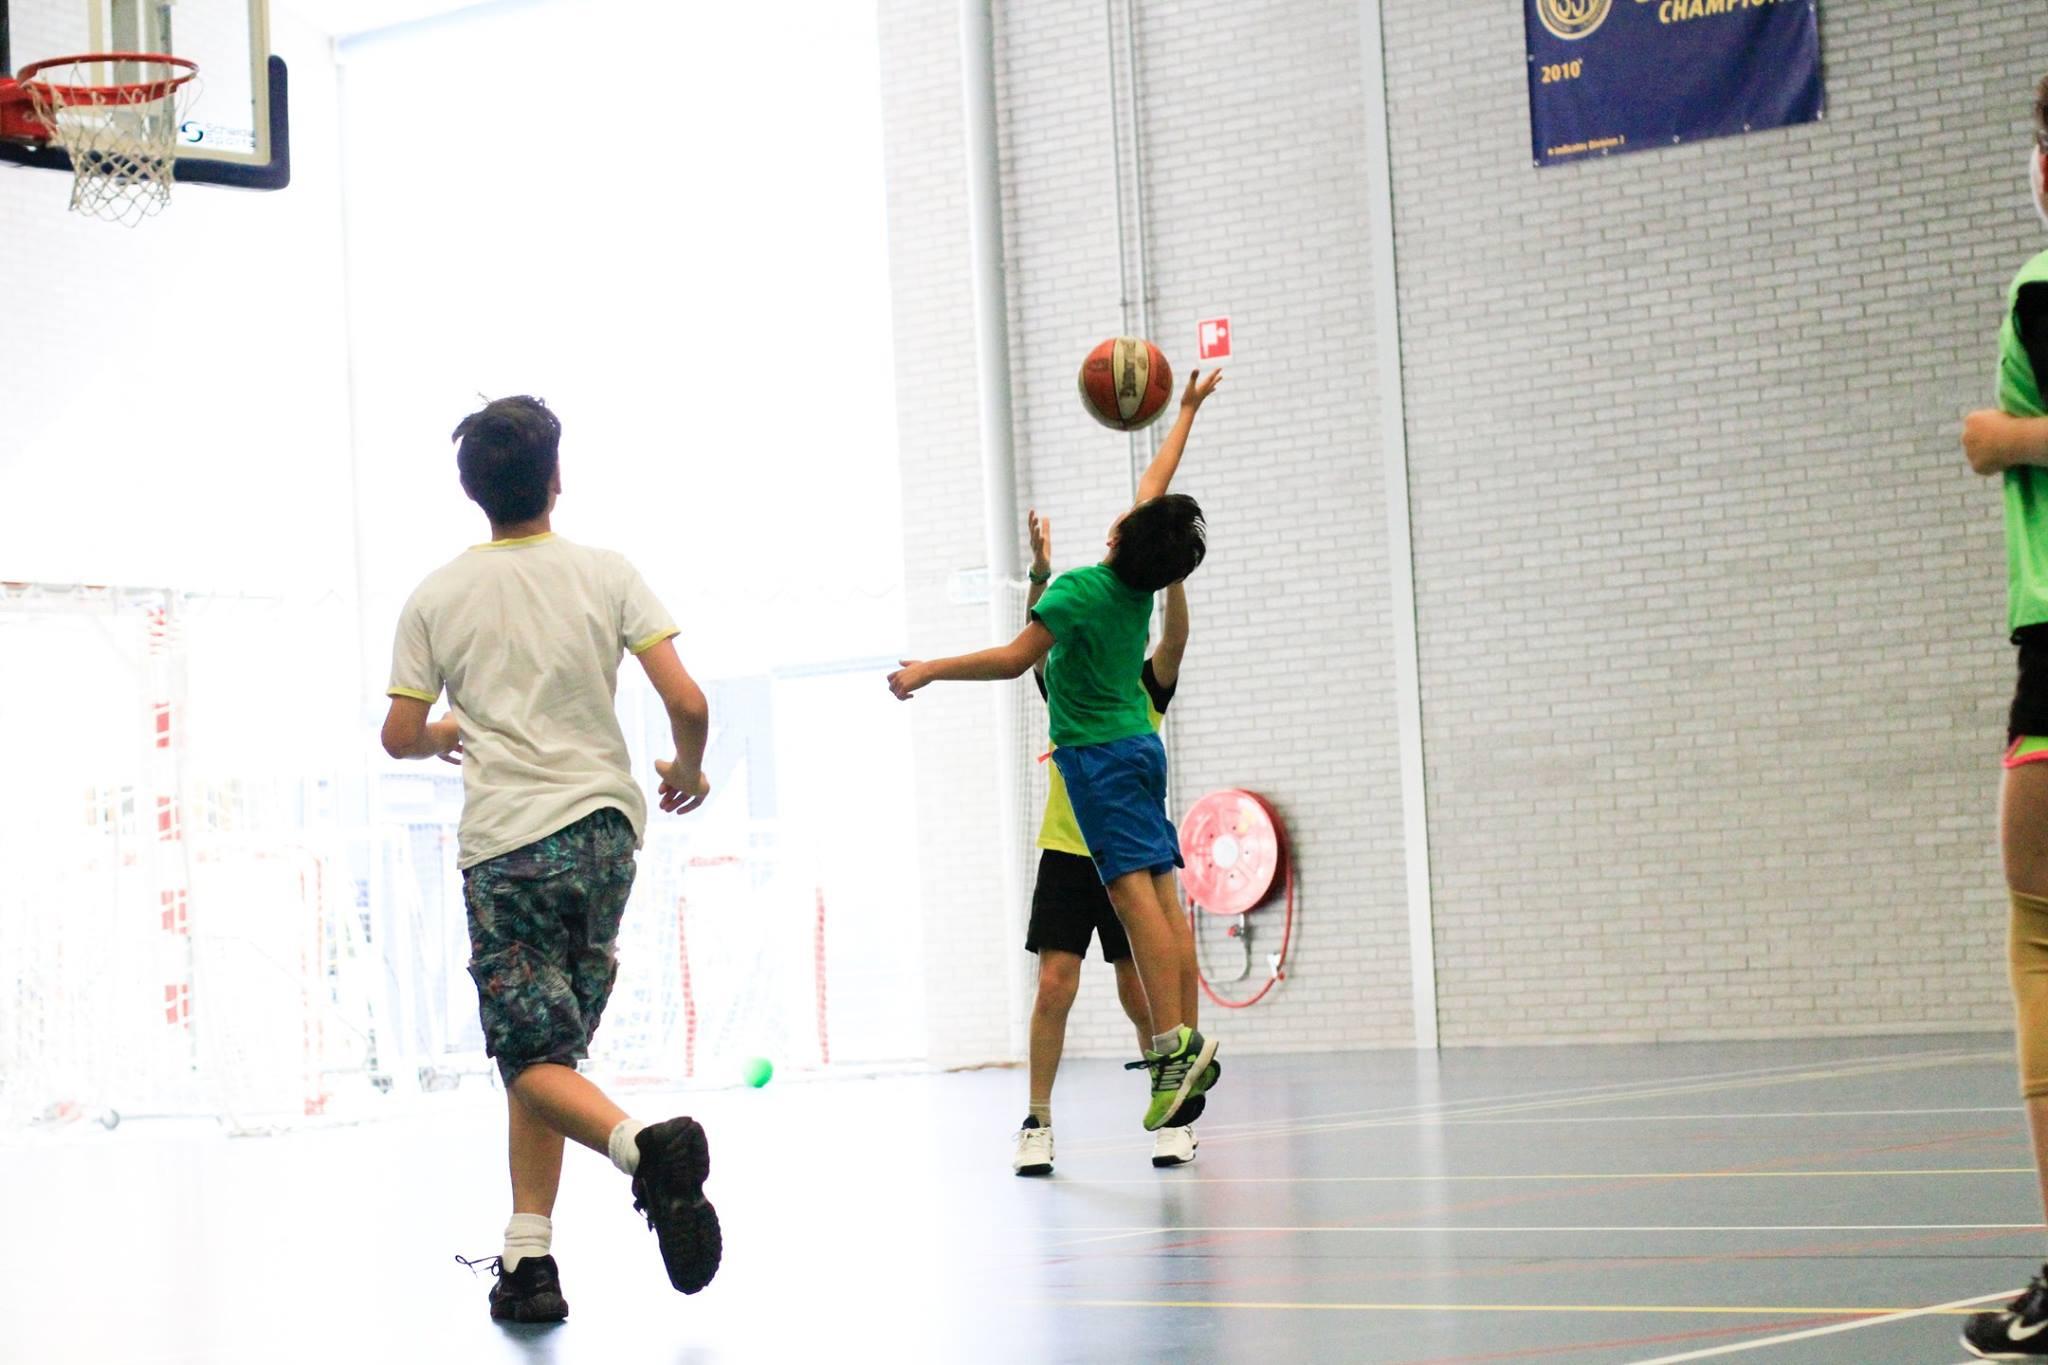 Basketball Clinic The Hague - sports camp - basketball camp - www.baskeballclinicthehague.nl